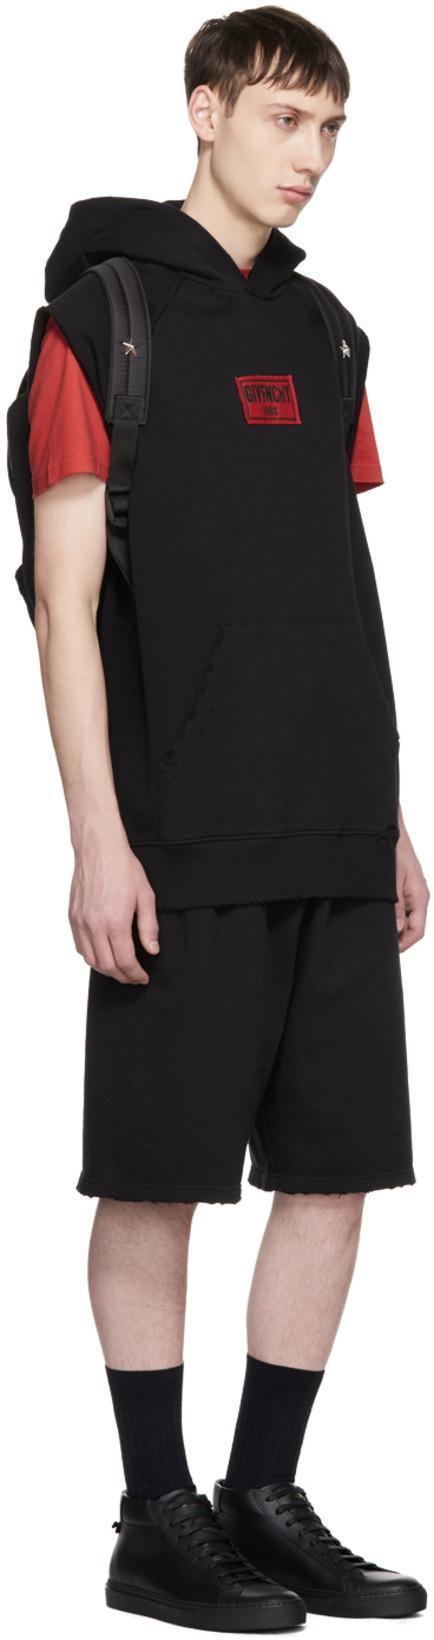 284d9cd964 Givenchy Black Nylon Stars Backpack